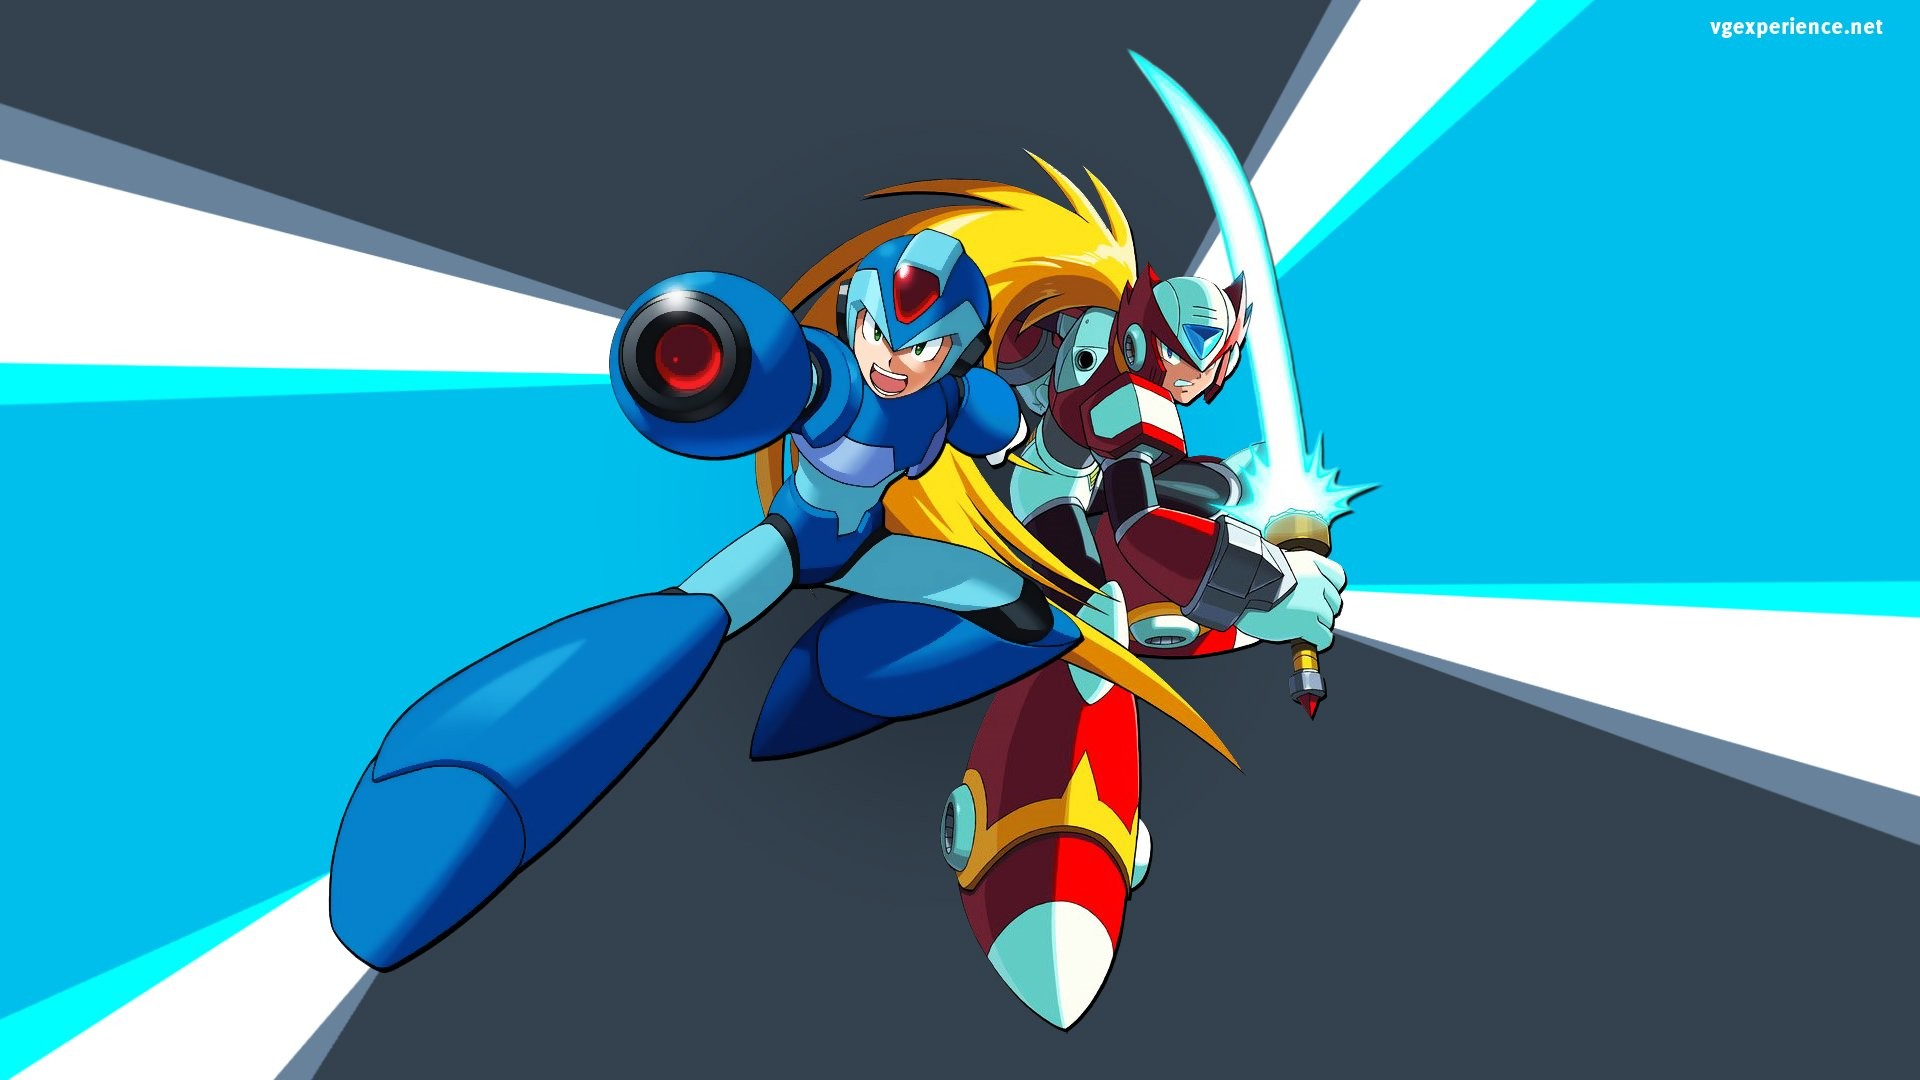 HD Wallpaper | Background ID:521732. Video Game Mega Man X